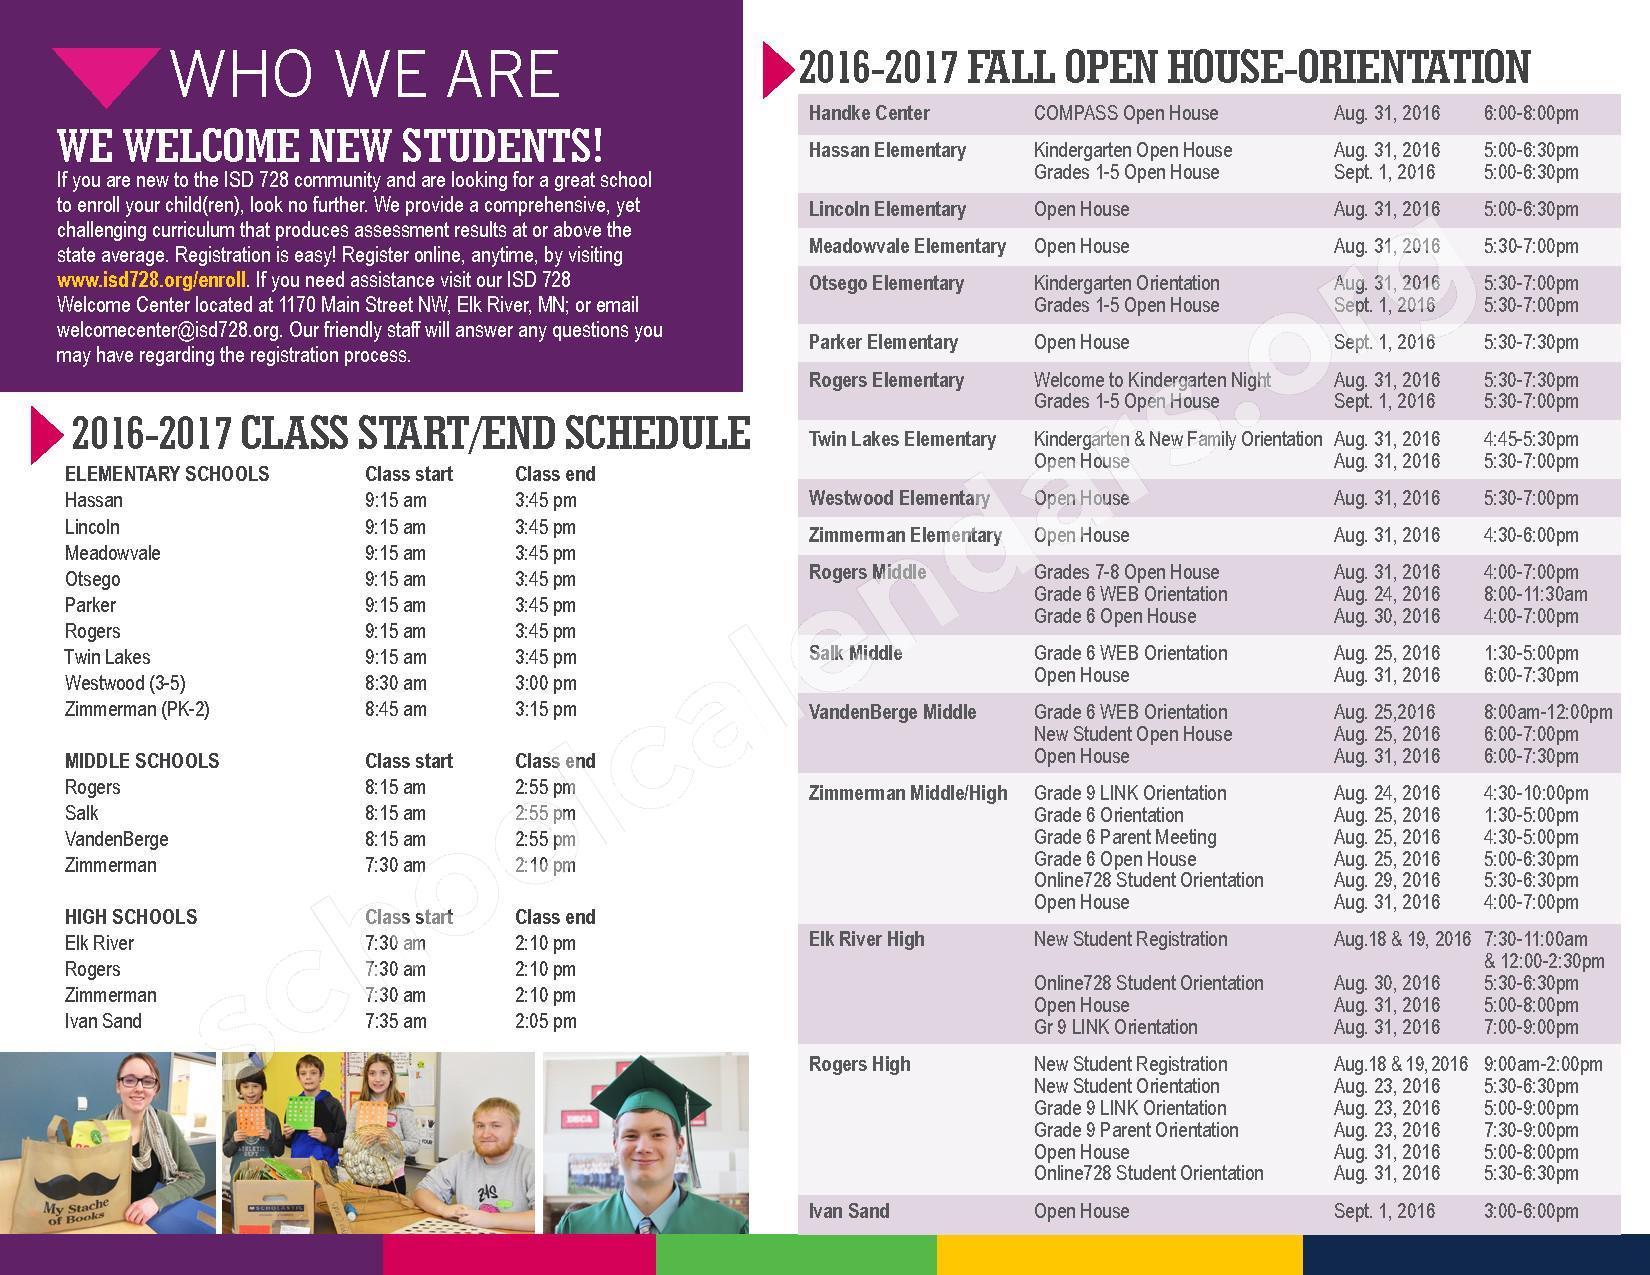 2016 - 2017 District Calendar – Vandenberge Middle School – page 29